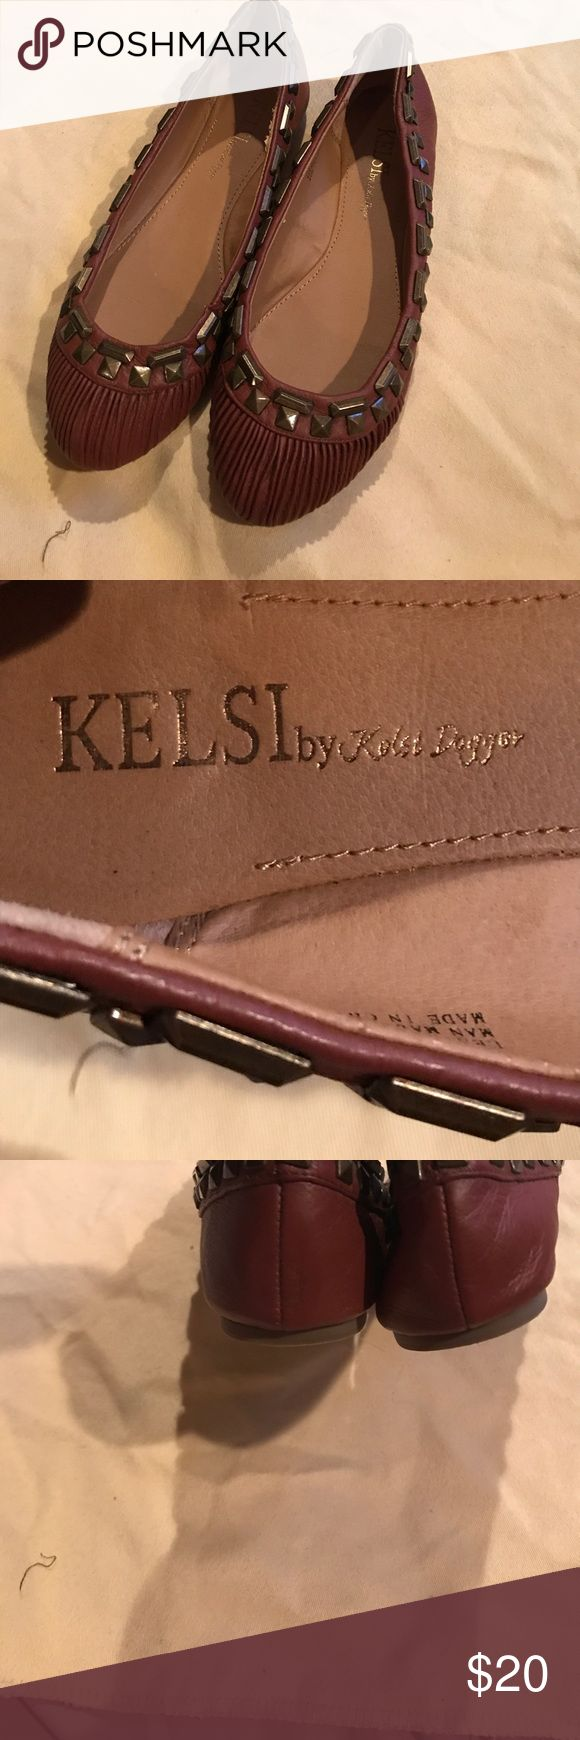 Kelsi by Kelsi Dagger Este Flats Kelsi by Kelsi Dagger Este Leather Flats with embellishments  in very good condition light wear on soles Kelsi Dagger Shoes Flats & Loafers